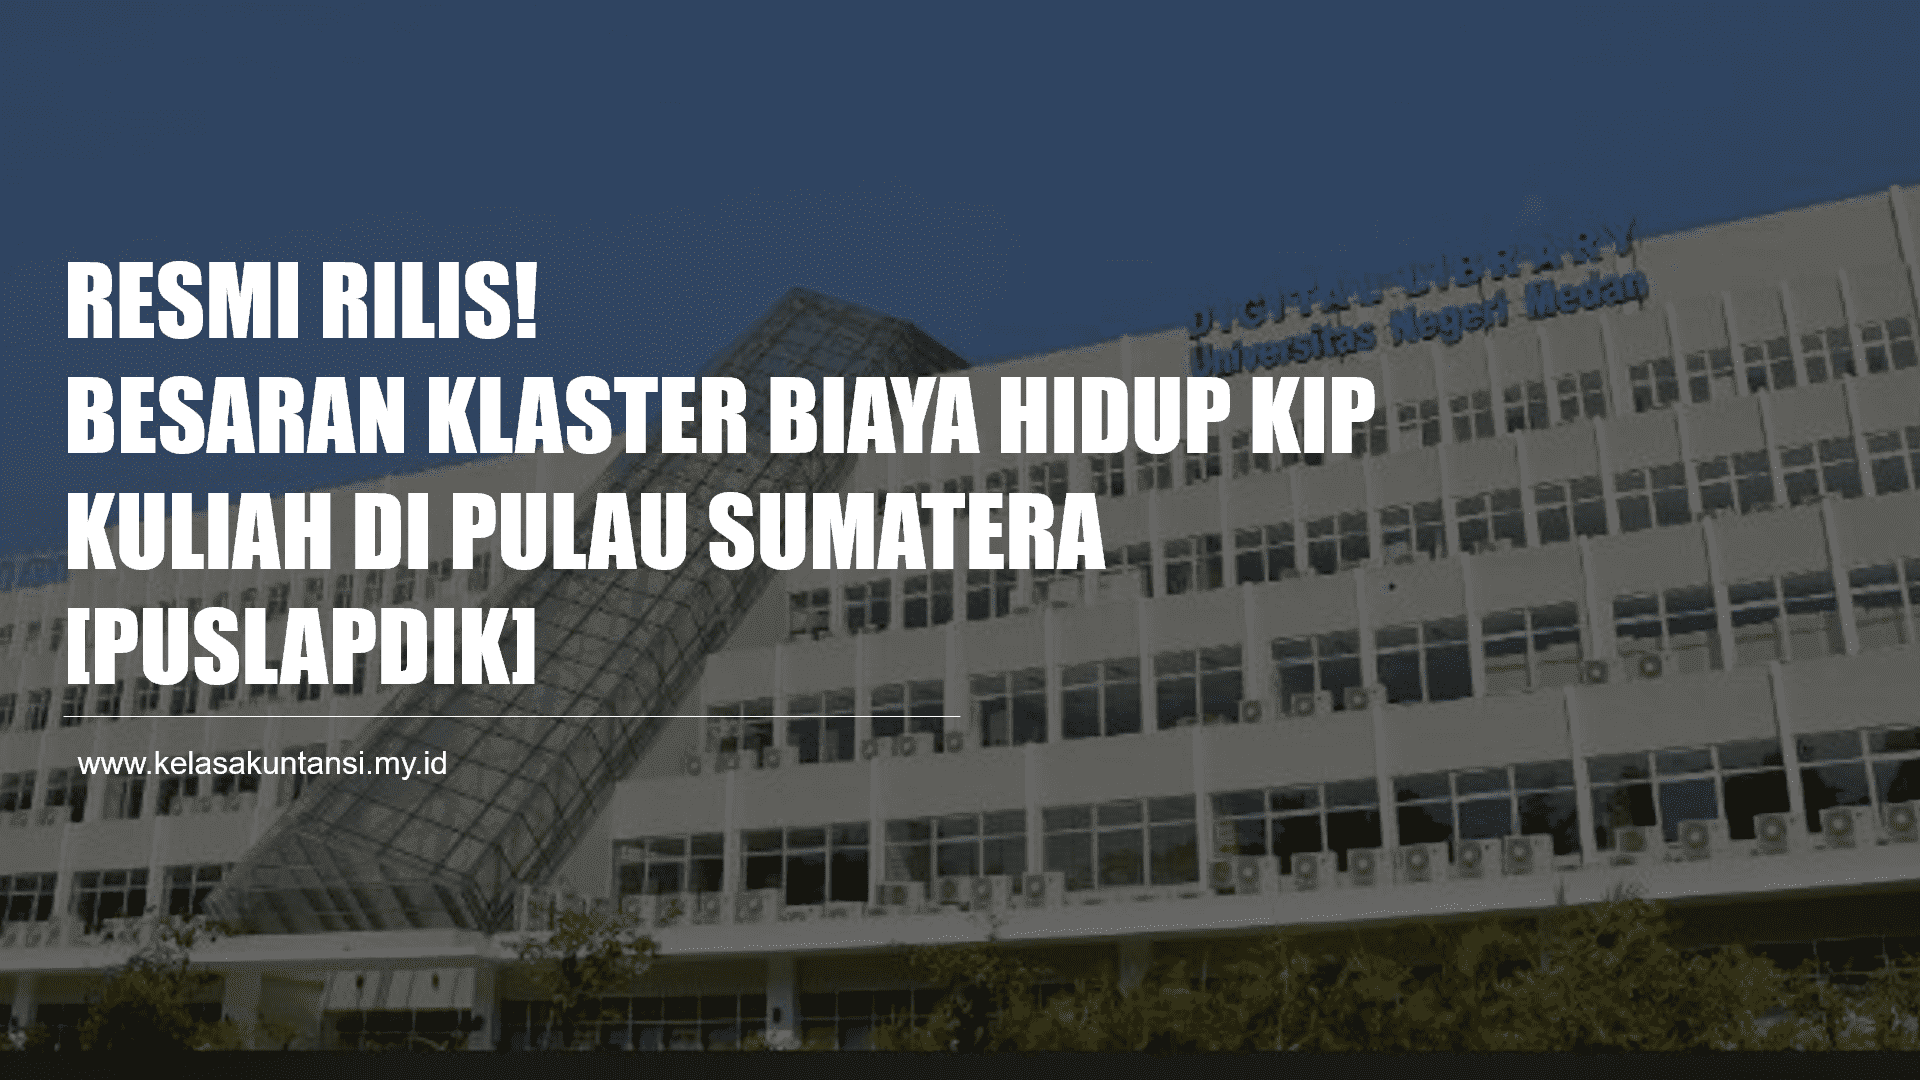 Resmi Rilis! Berikut Besaran Klaster Biaya Hidup KIP Kuliah 2021 di Pulau Sumatera [Puslapdik]